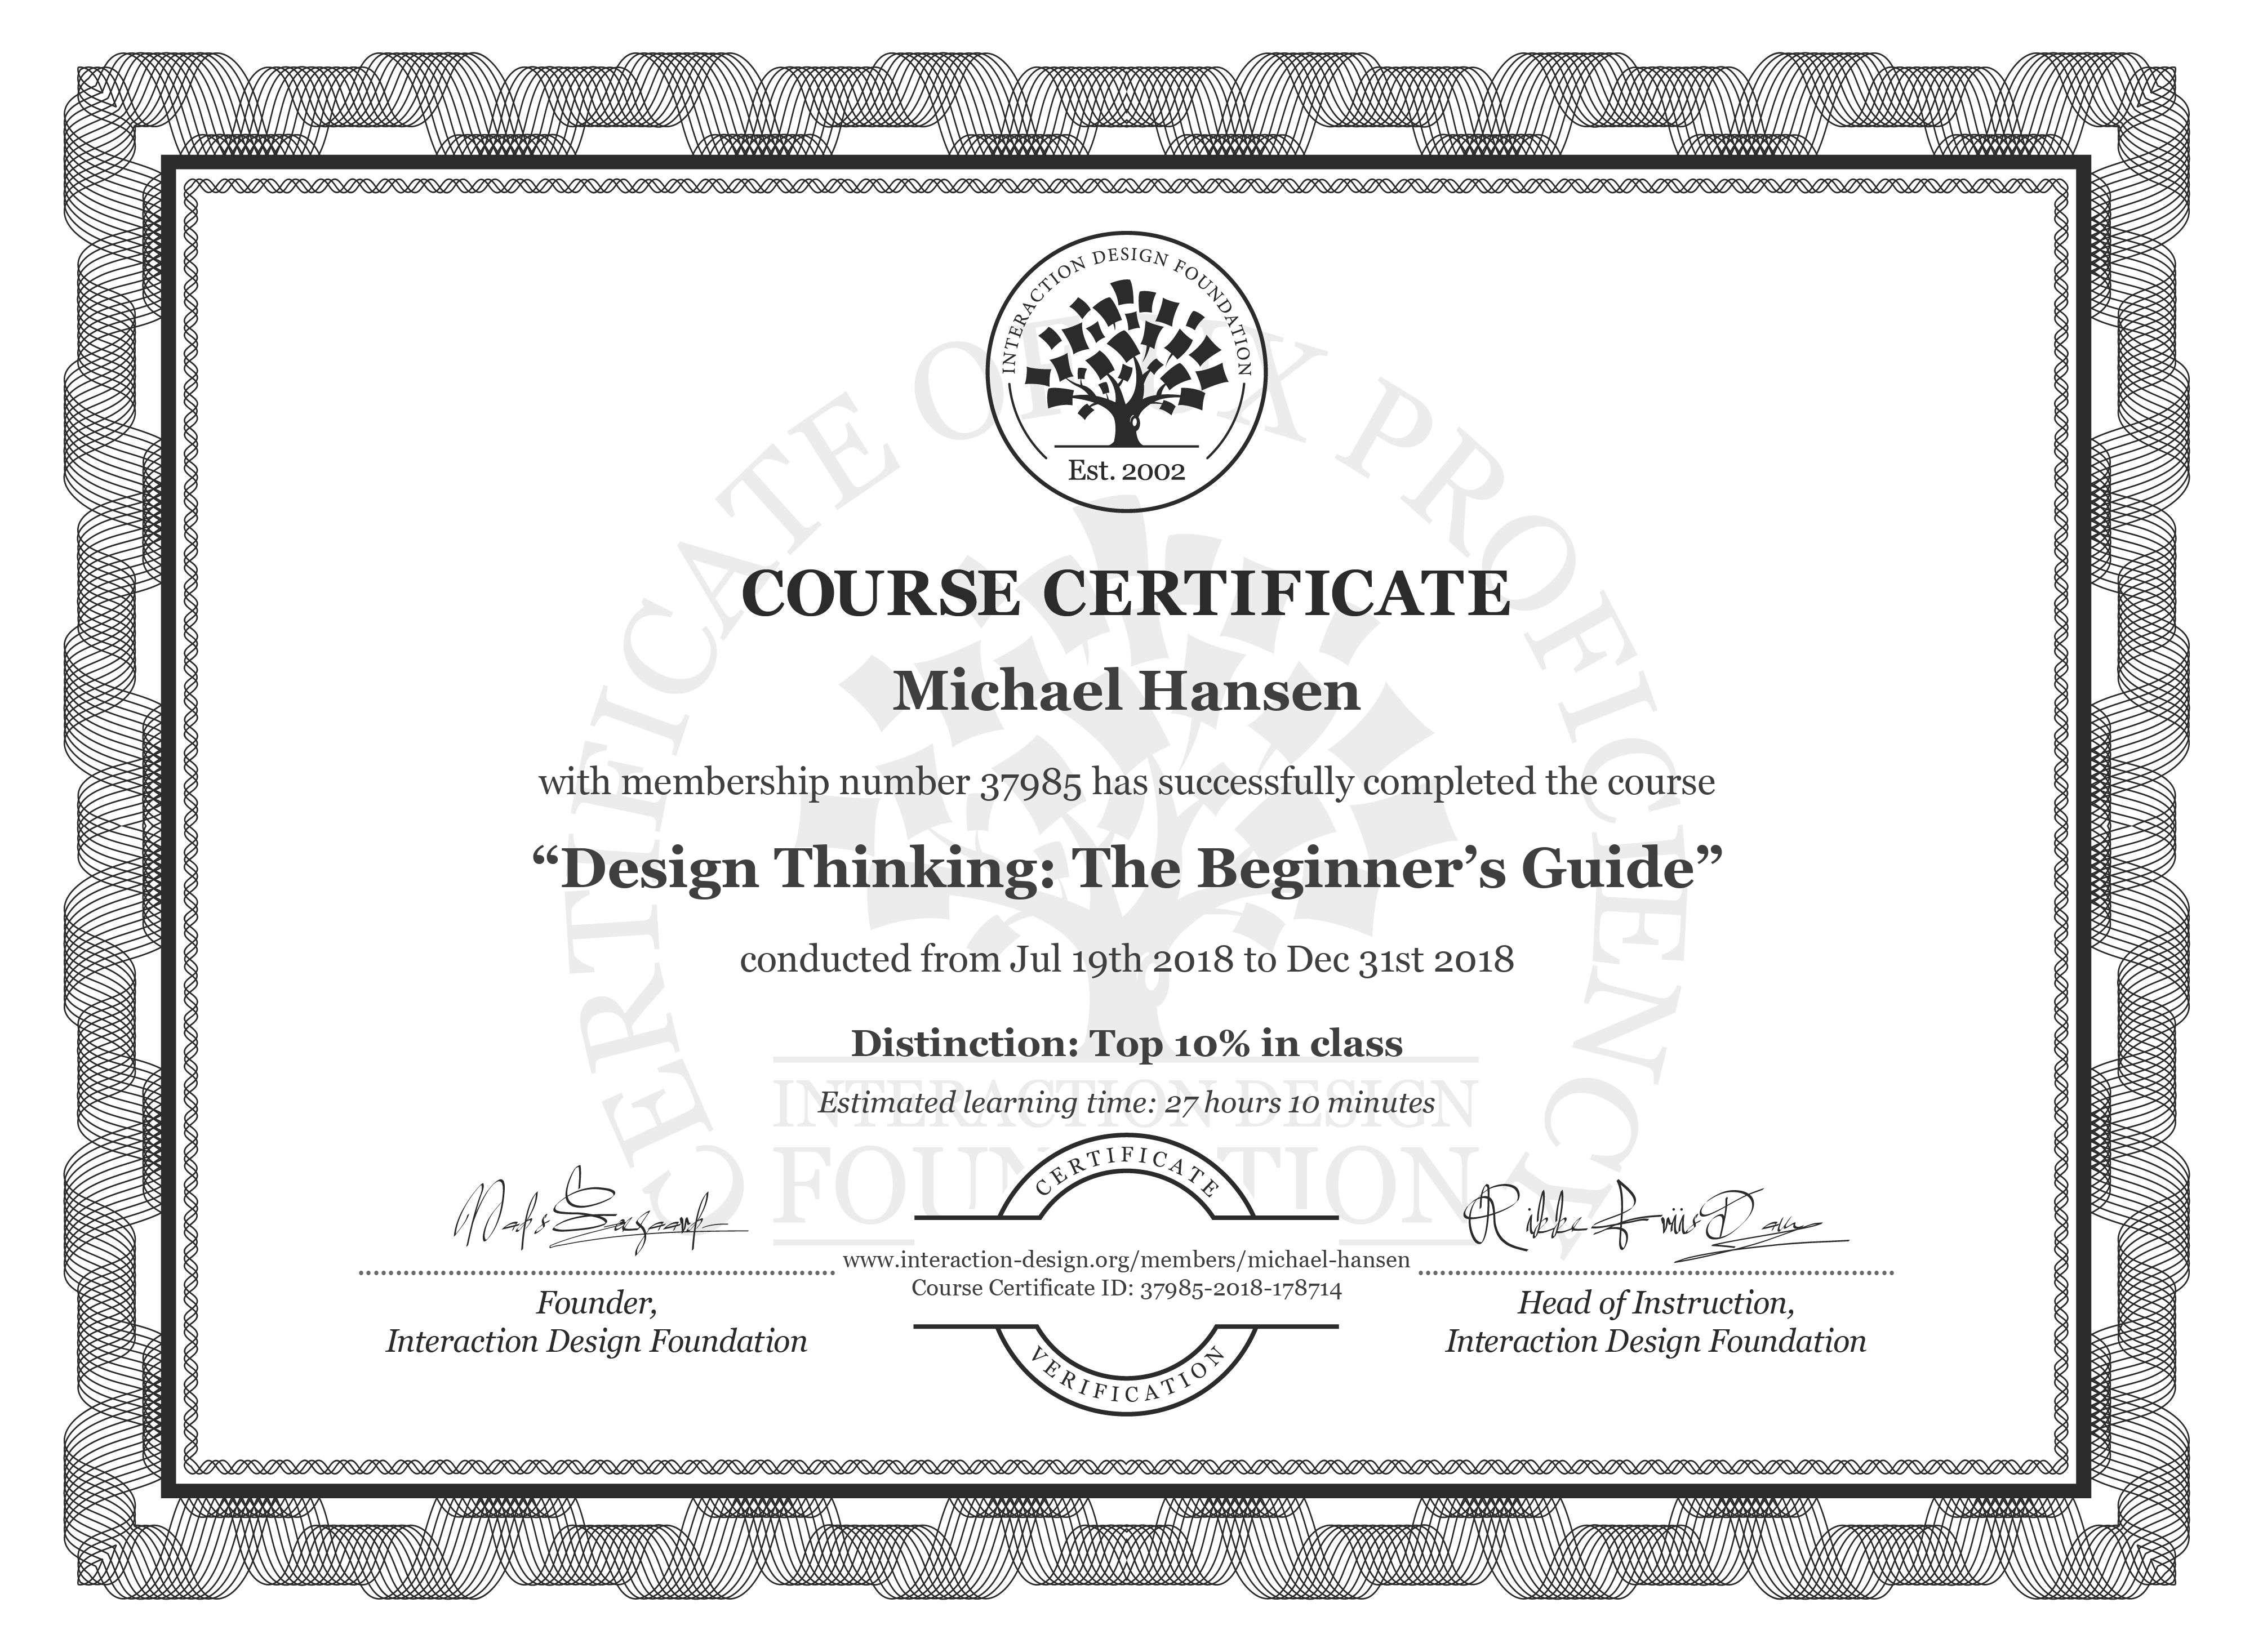 Michael Hansen's Course Certificate: Design Thinking: The Beginner's Guide